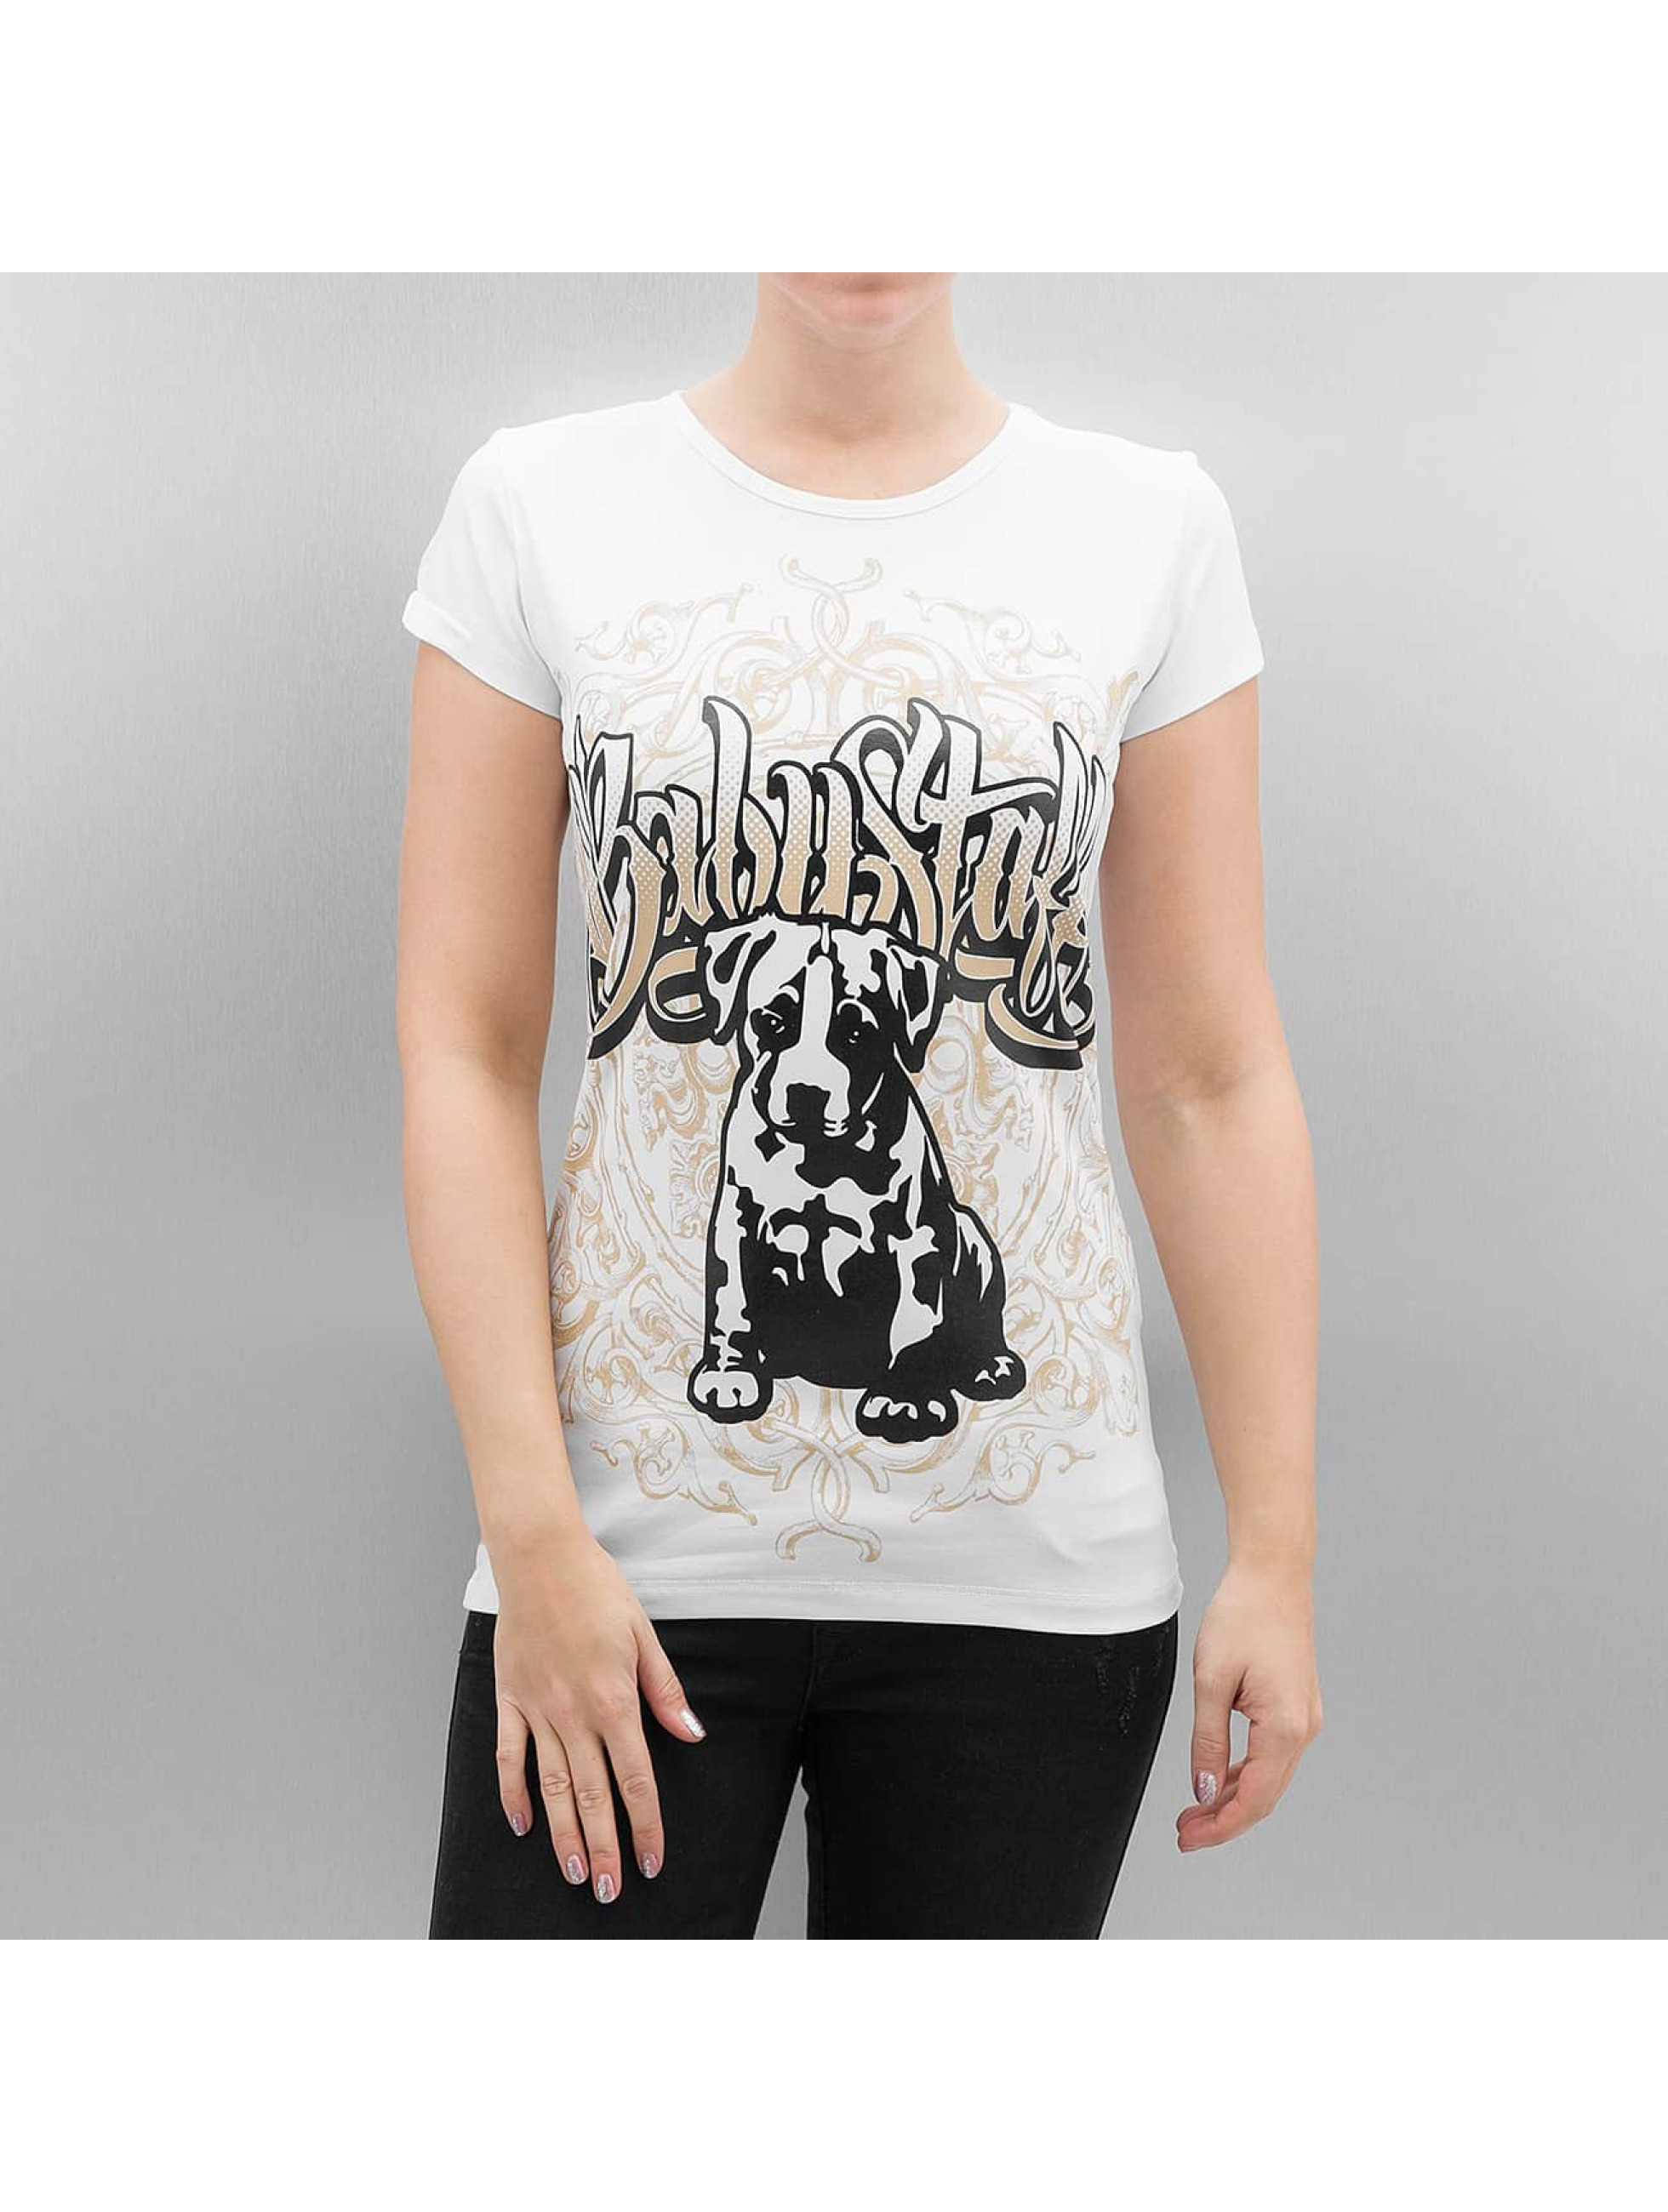 Babystaff T-Shirt Daxima white